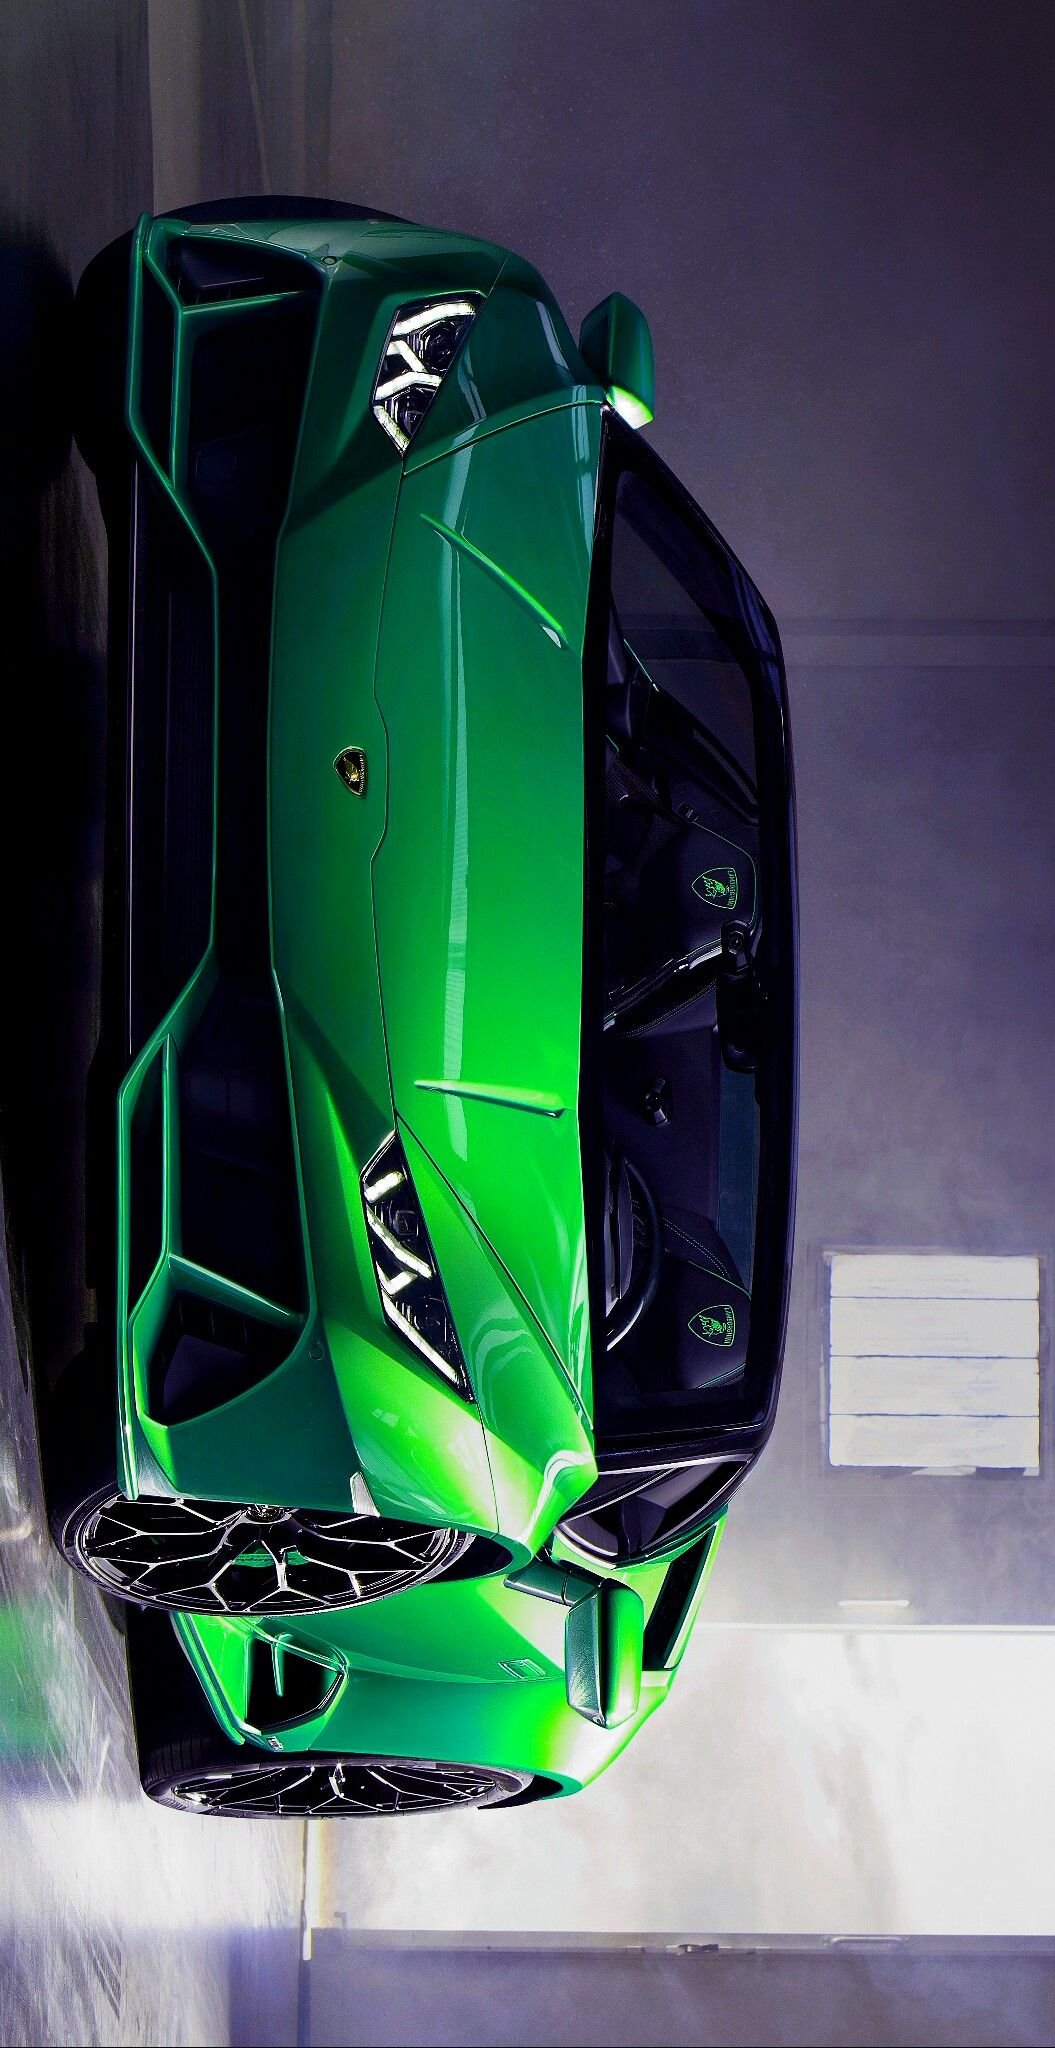 2019 Lamborghini Huracan Evo Spyder Image Enhancements By Keely